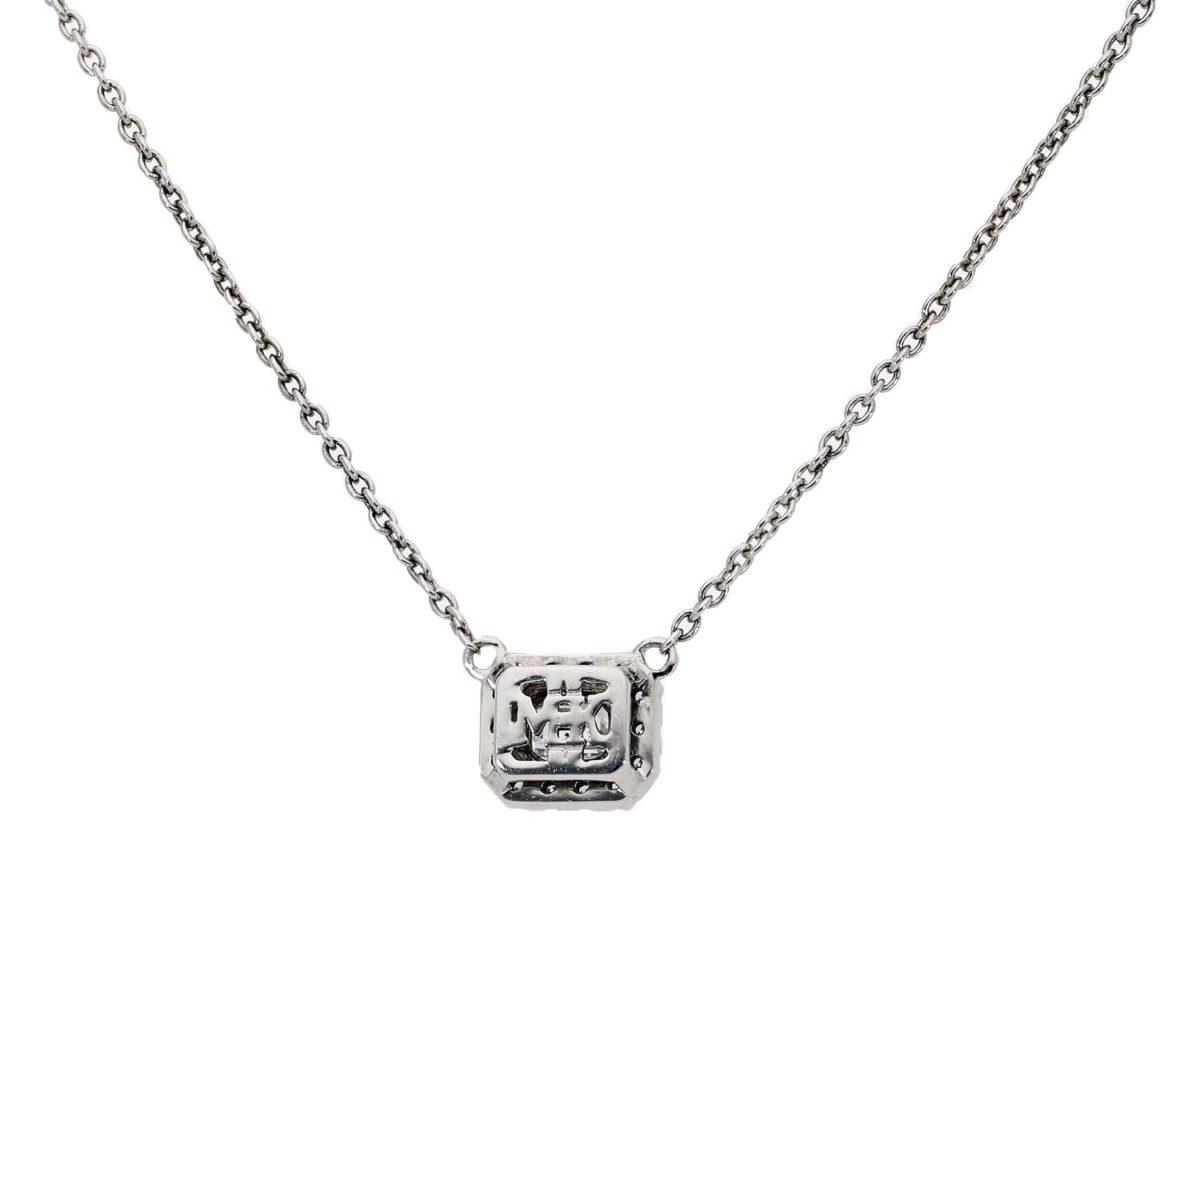 Diamond NecklaceStyle #: MK-834015